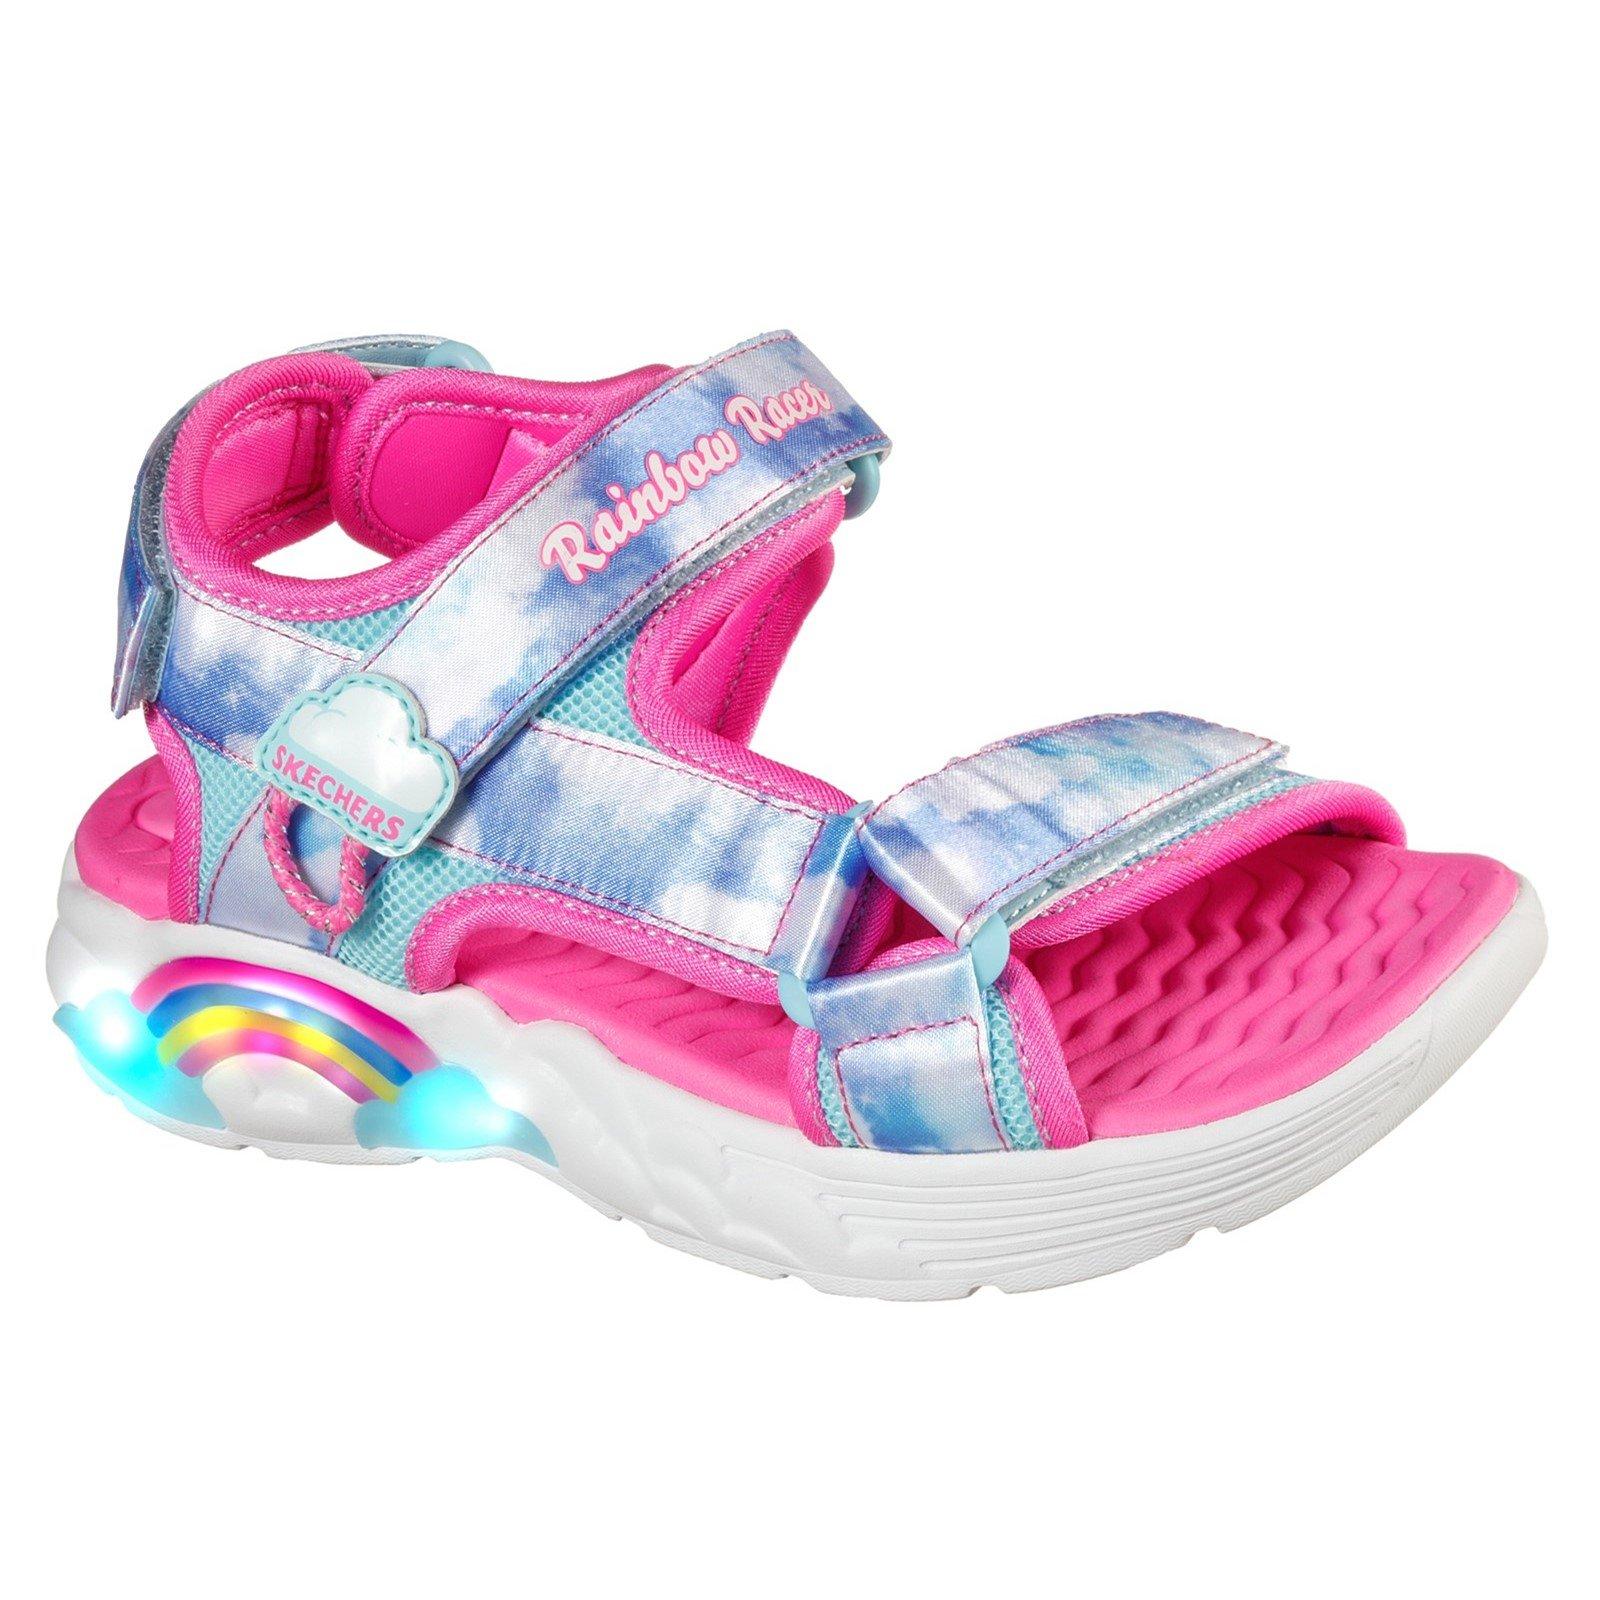 Skechers Unisex Rainbow Racer Summer Sky Beach Sandals Multicolor 32096 - Pink/Blue Textile 3